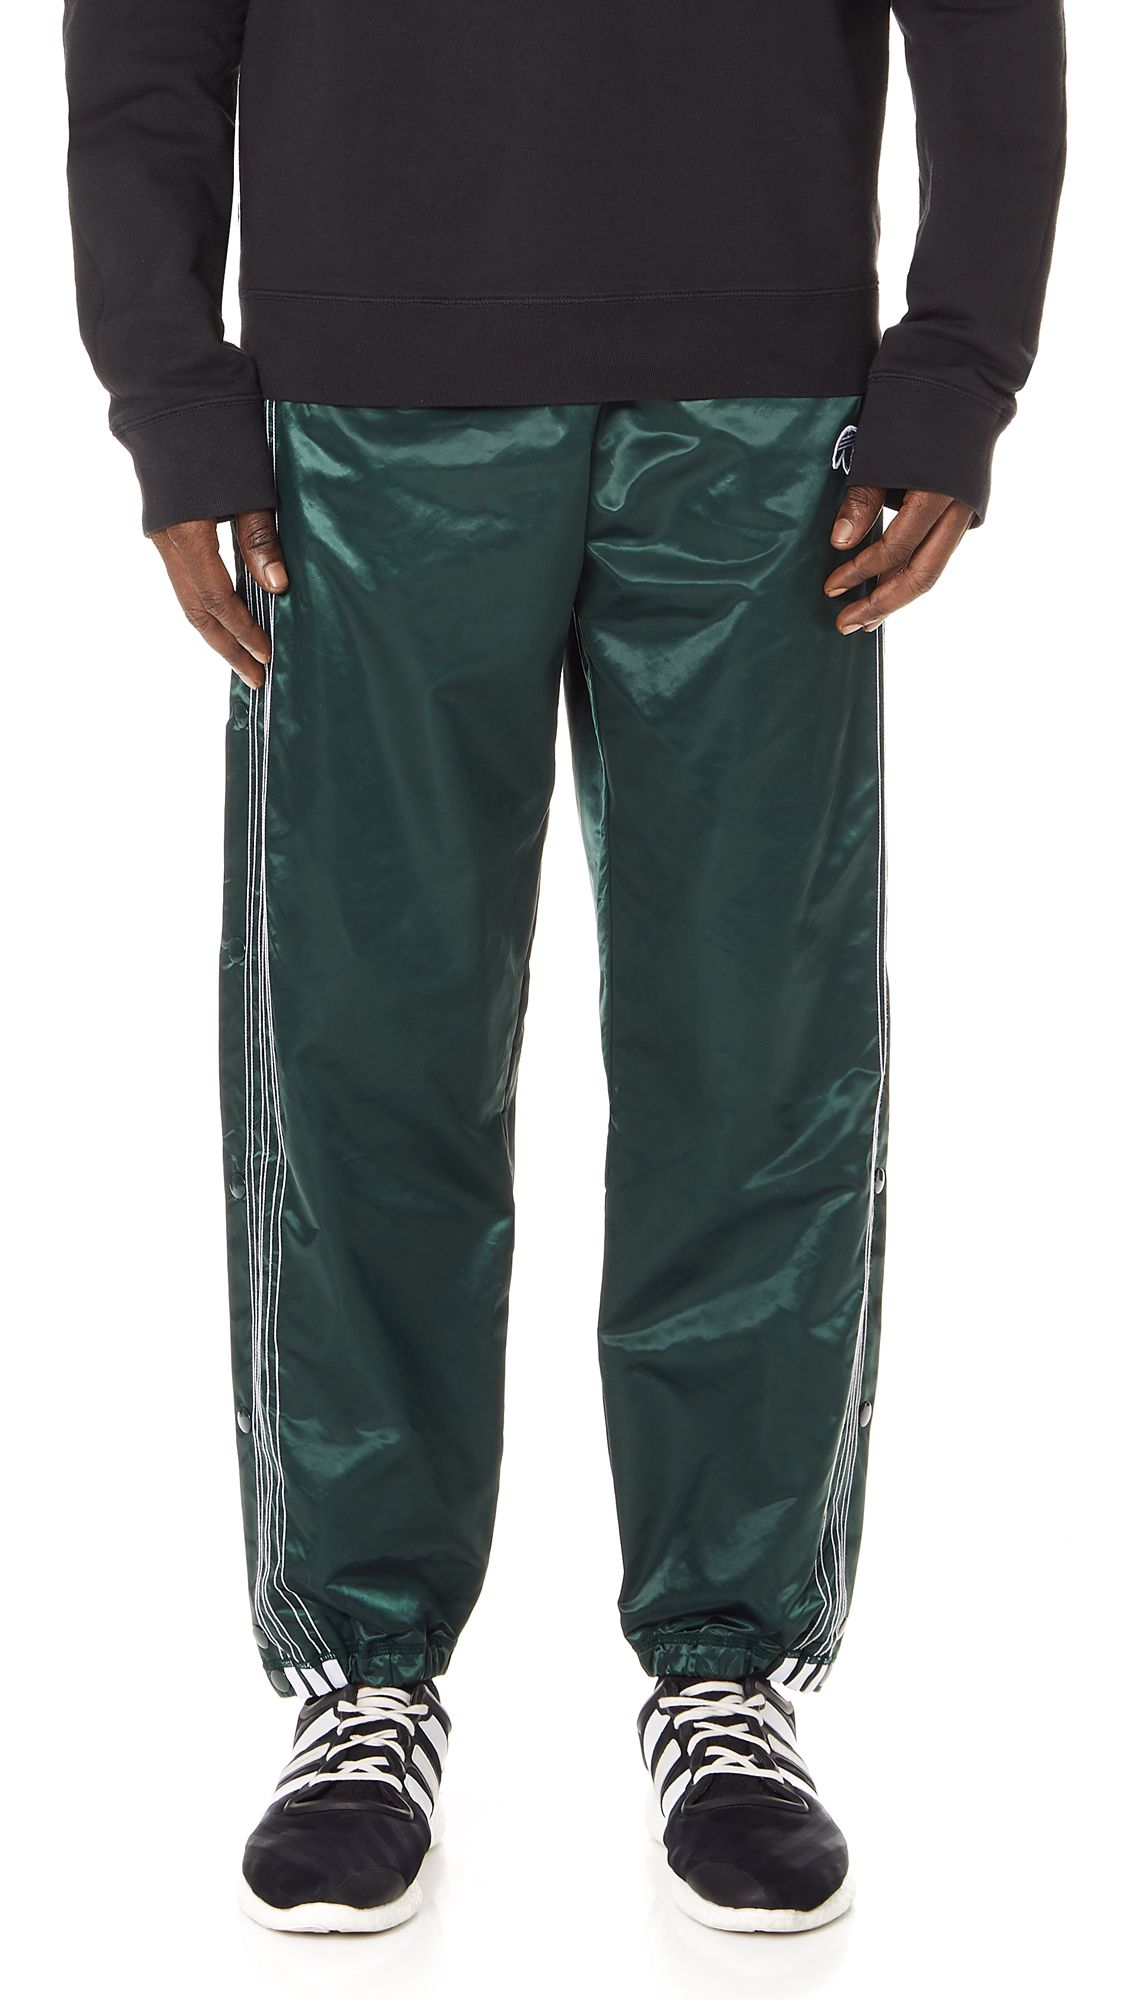 Aw Adibreak By Pants in Grün | Adidas Originals By Adibreak Alexander Wang Men 2de6ce